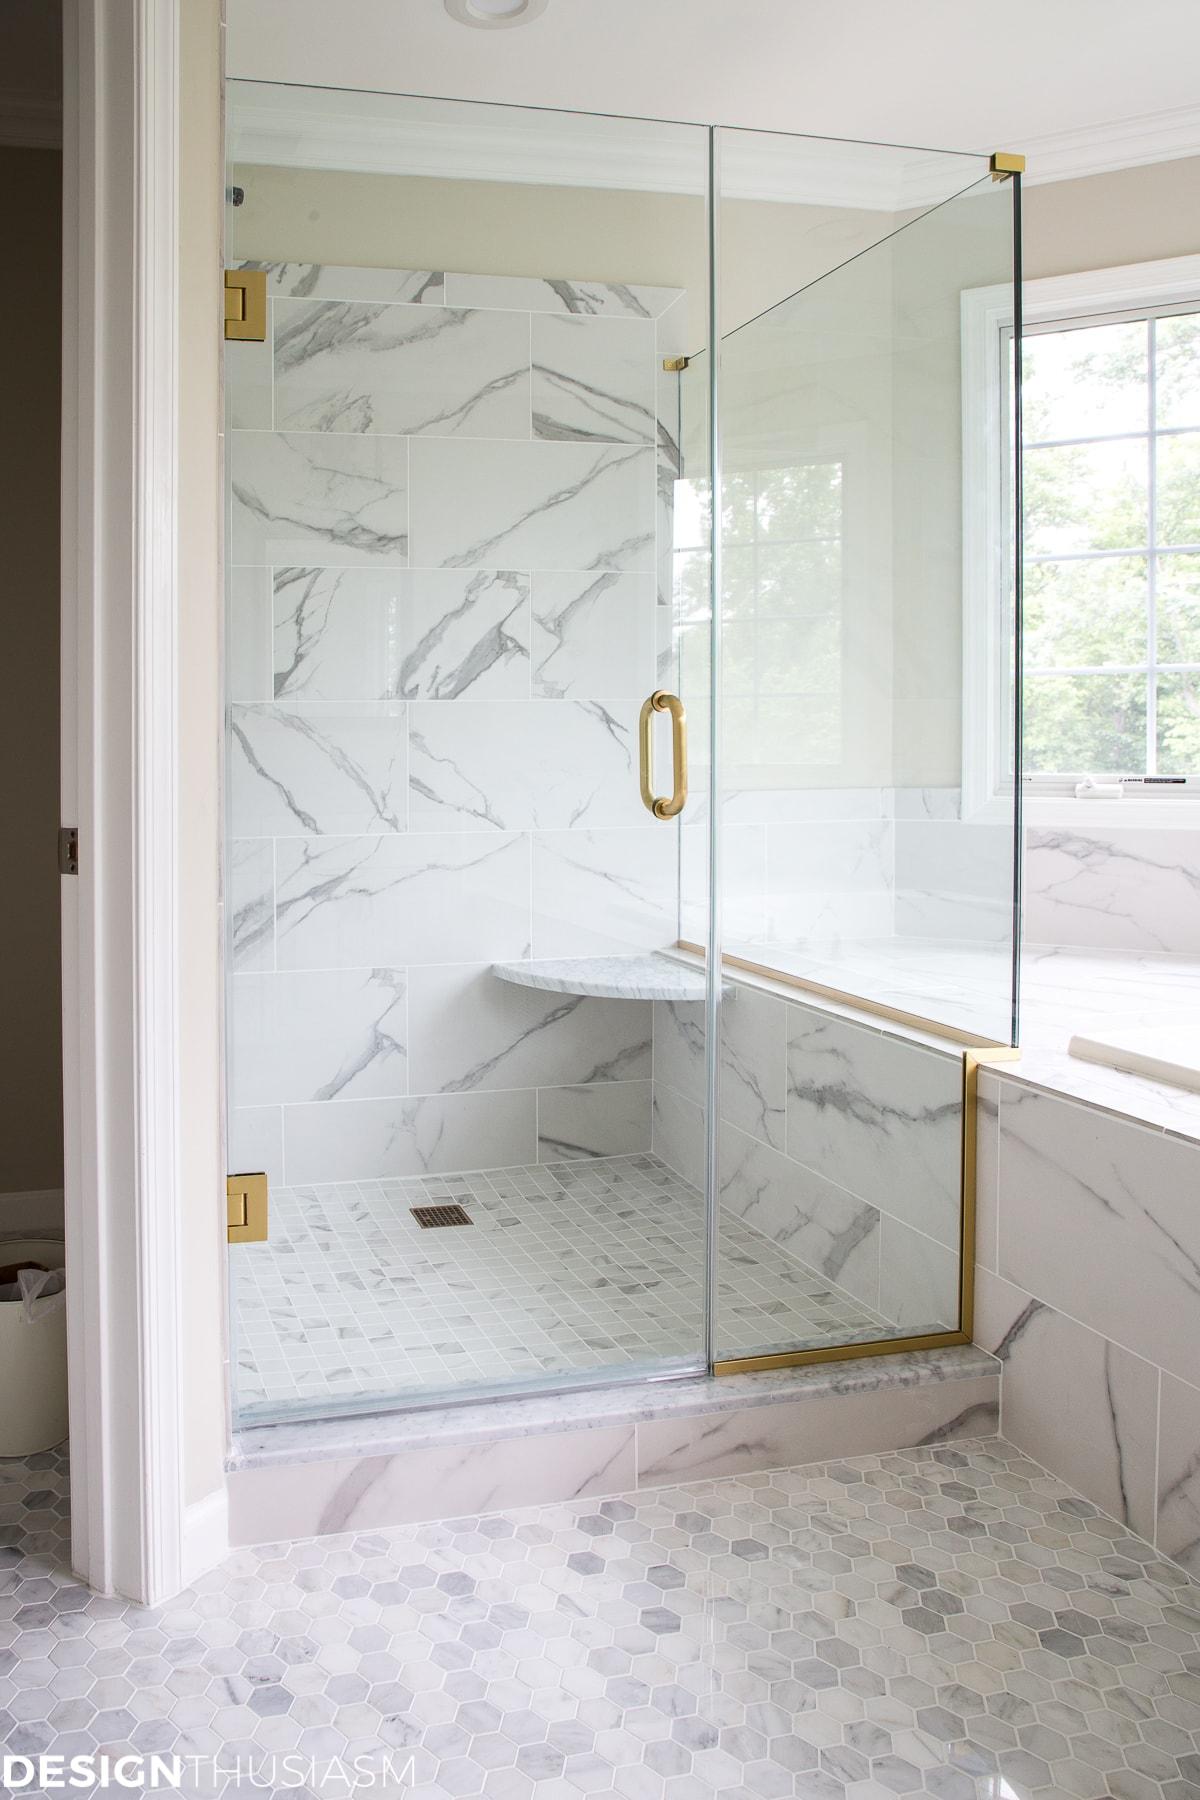 Using Bathroom Tiles to Transform a Builder\'s Grade Master Bath